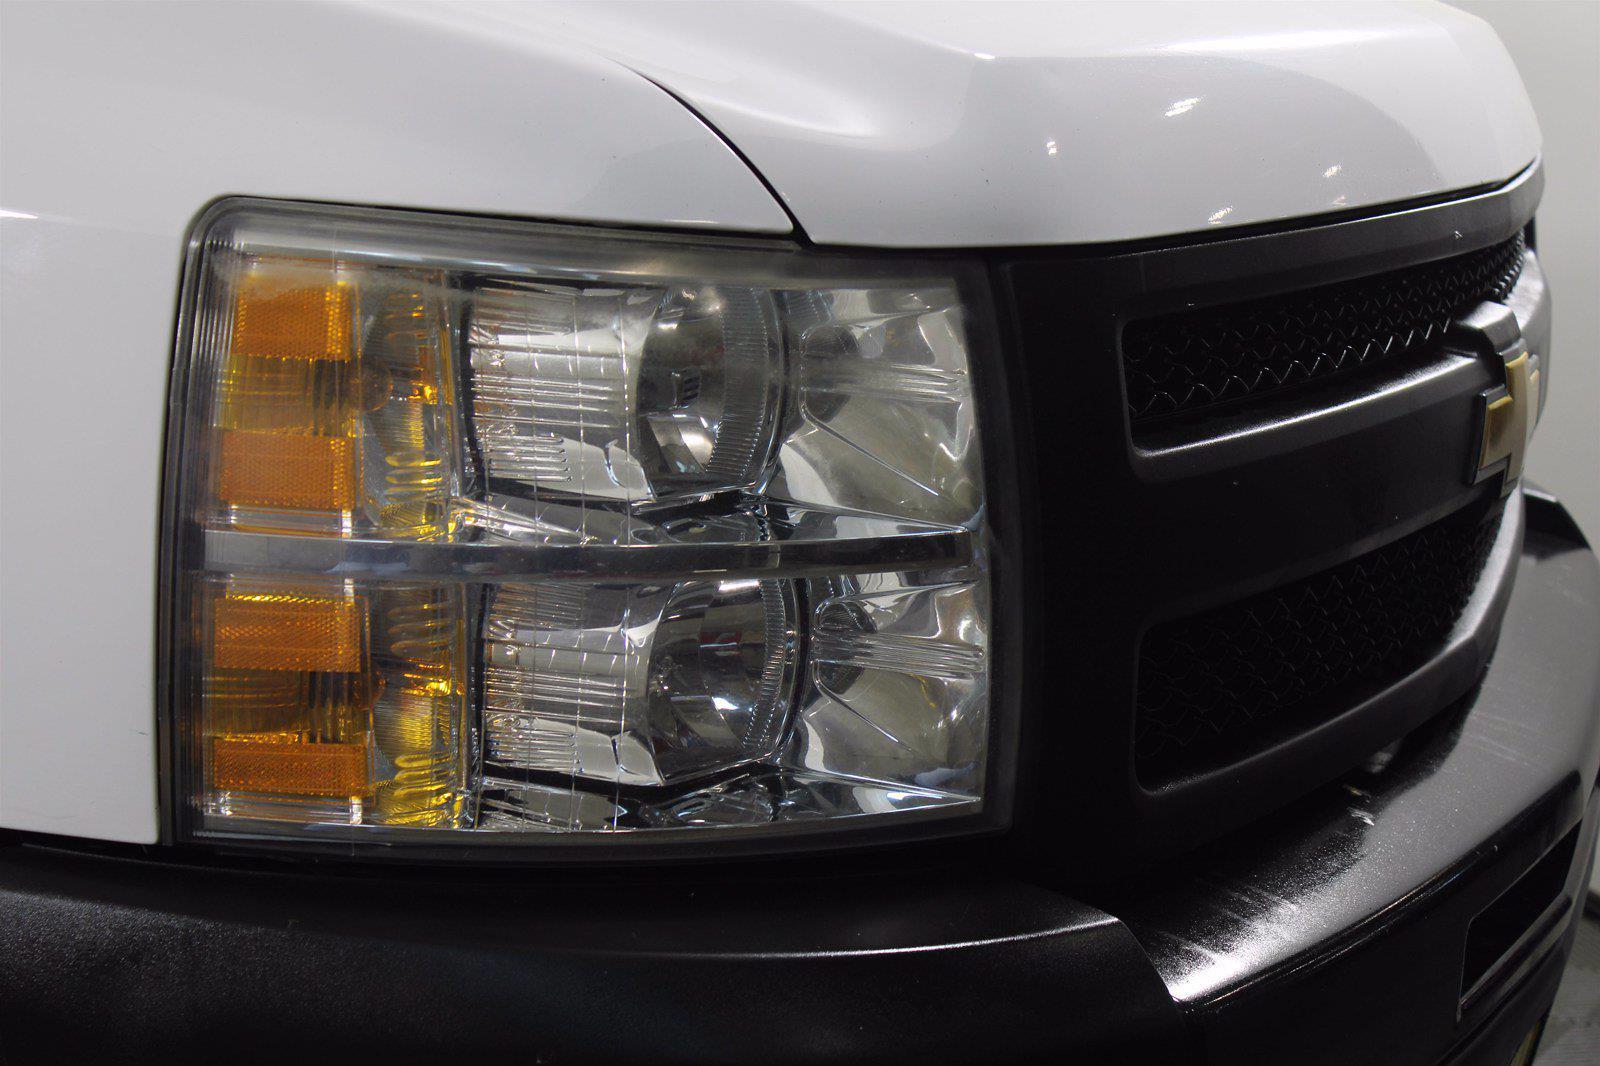 2012 Silverado 1500 Regular Cab 4x4,  Pickup #D120034A - photo 4